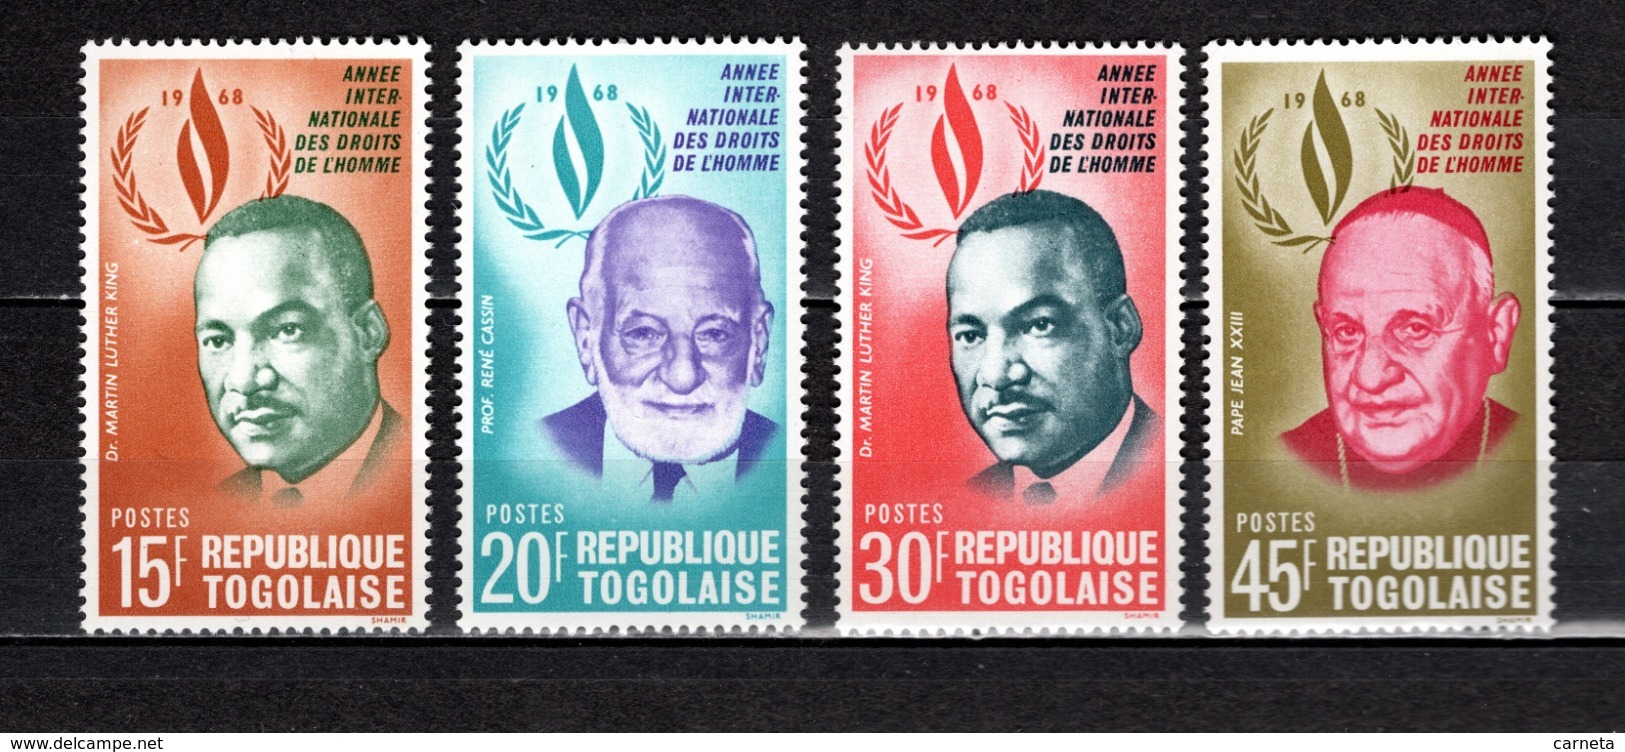 TOGO N° 597 à 600  NEUFS SANS CHARNIERE COTE  4.00€  PRESIDENT  MARTIN LUTHER KING - Togo (1960-...)